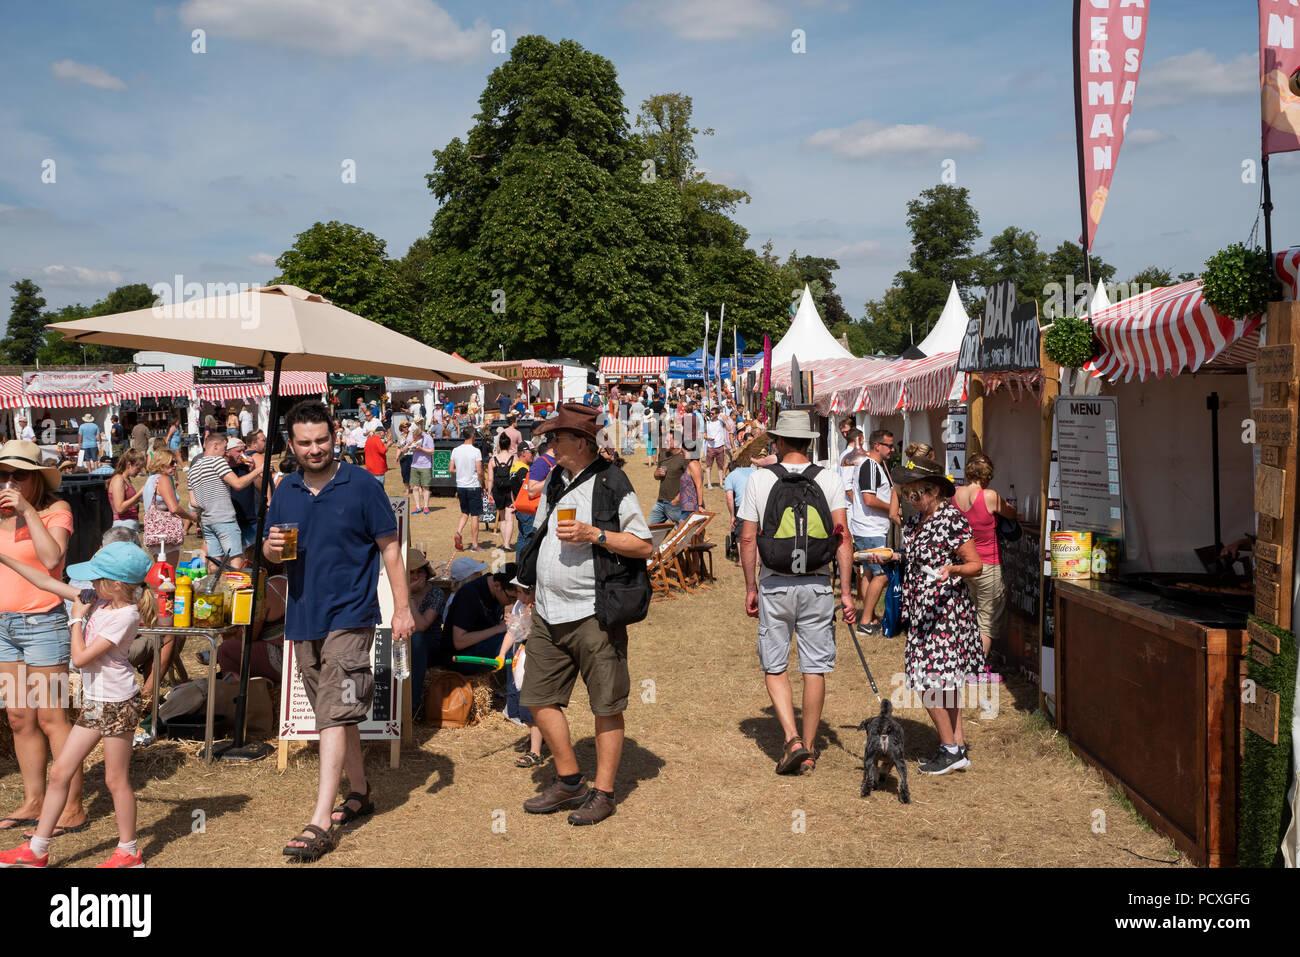 Bbc Food Festival Oxford